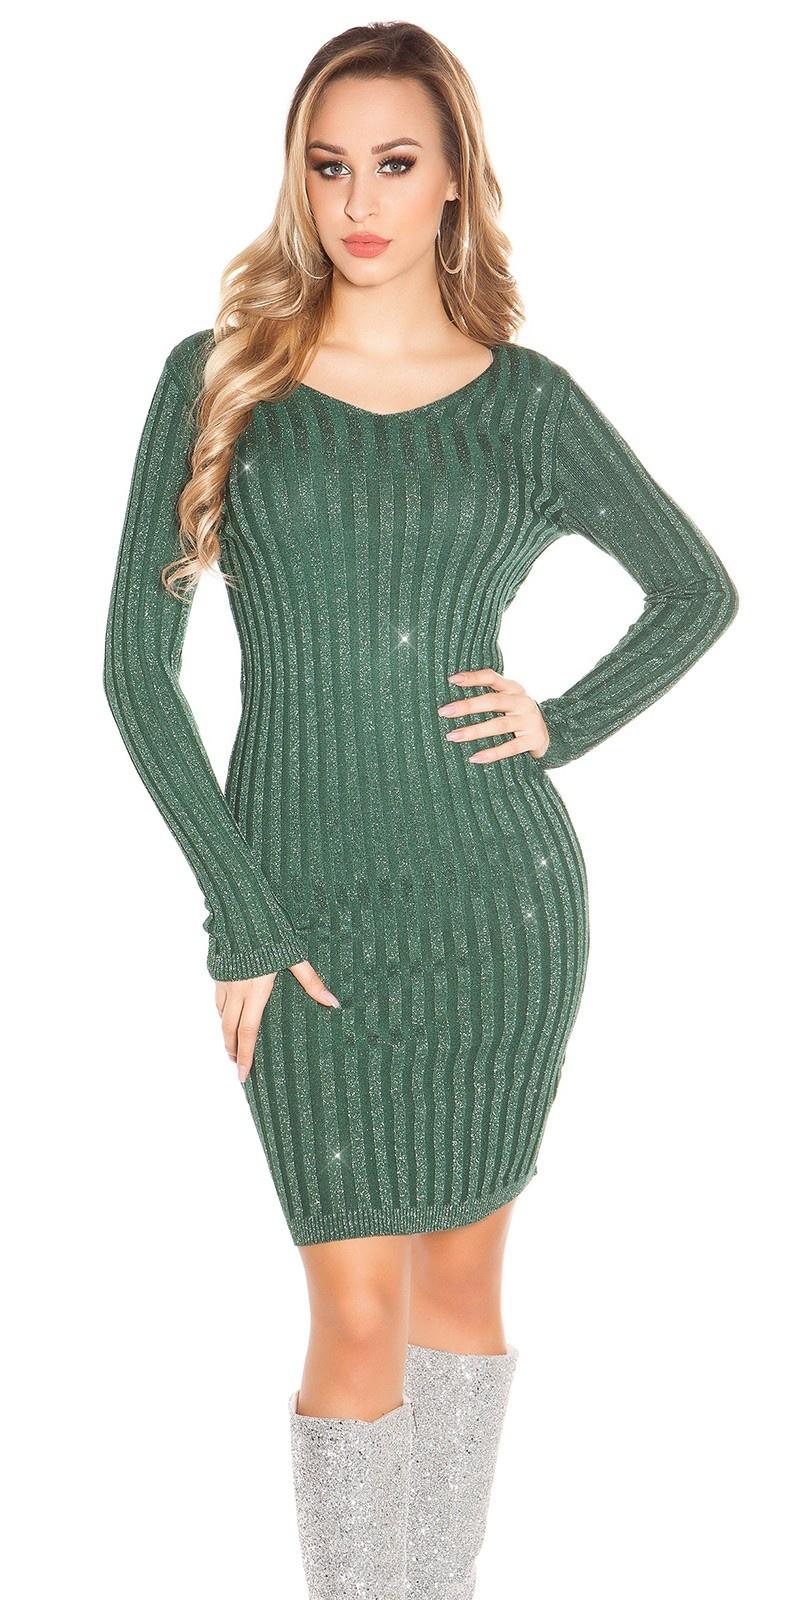 Sexy V-cut knit dress with glitter threads Green